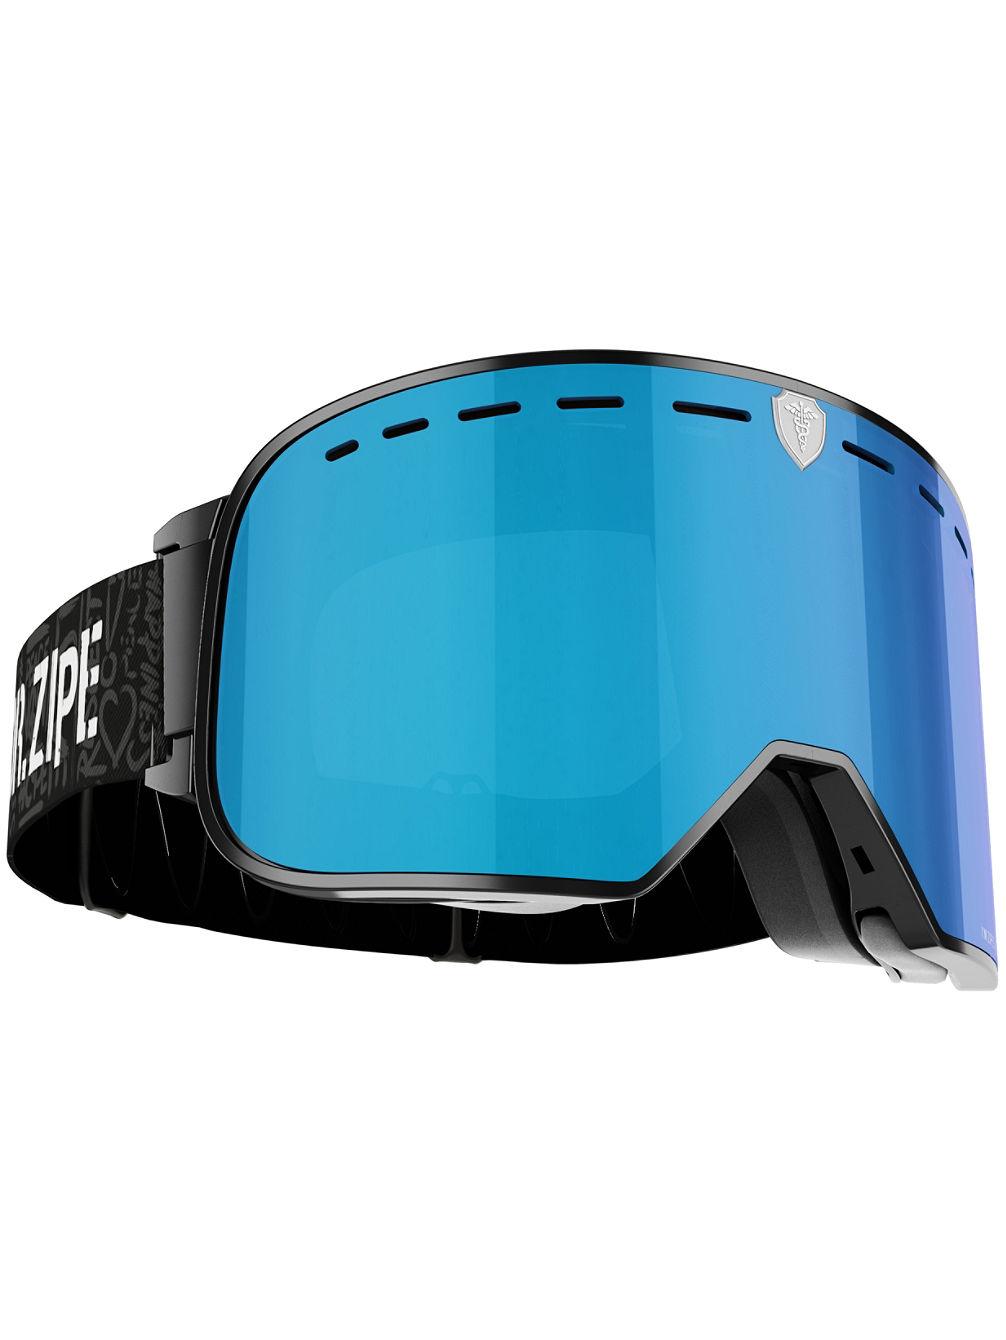 Dr.Zipe Savage Level 7 Black NV Non Violence Goggle